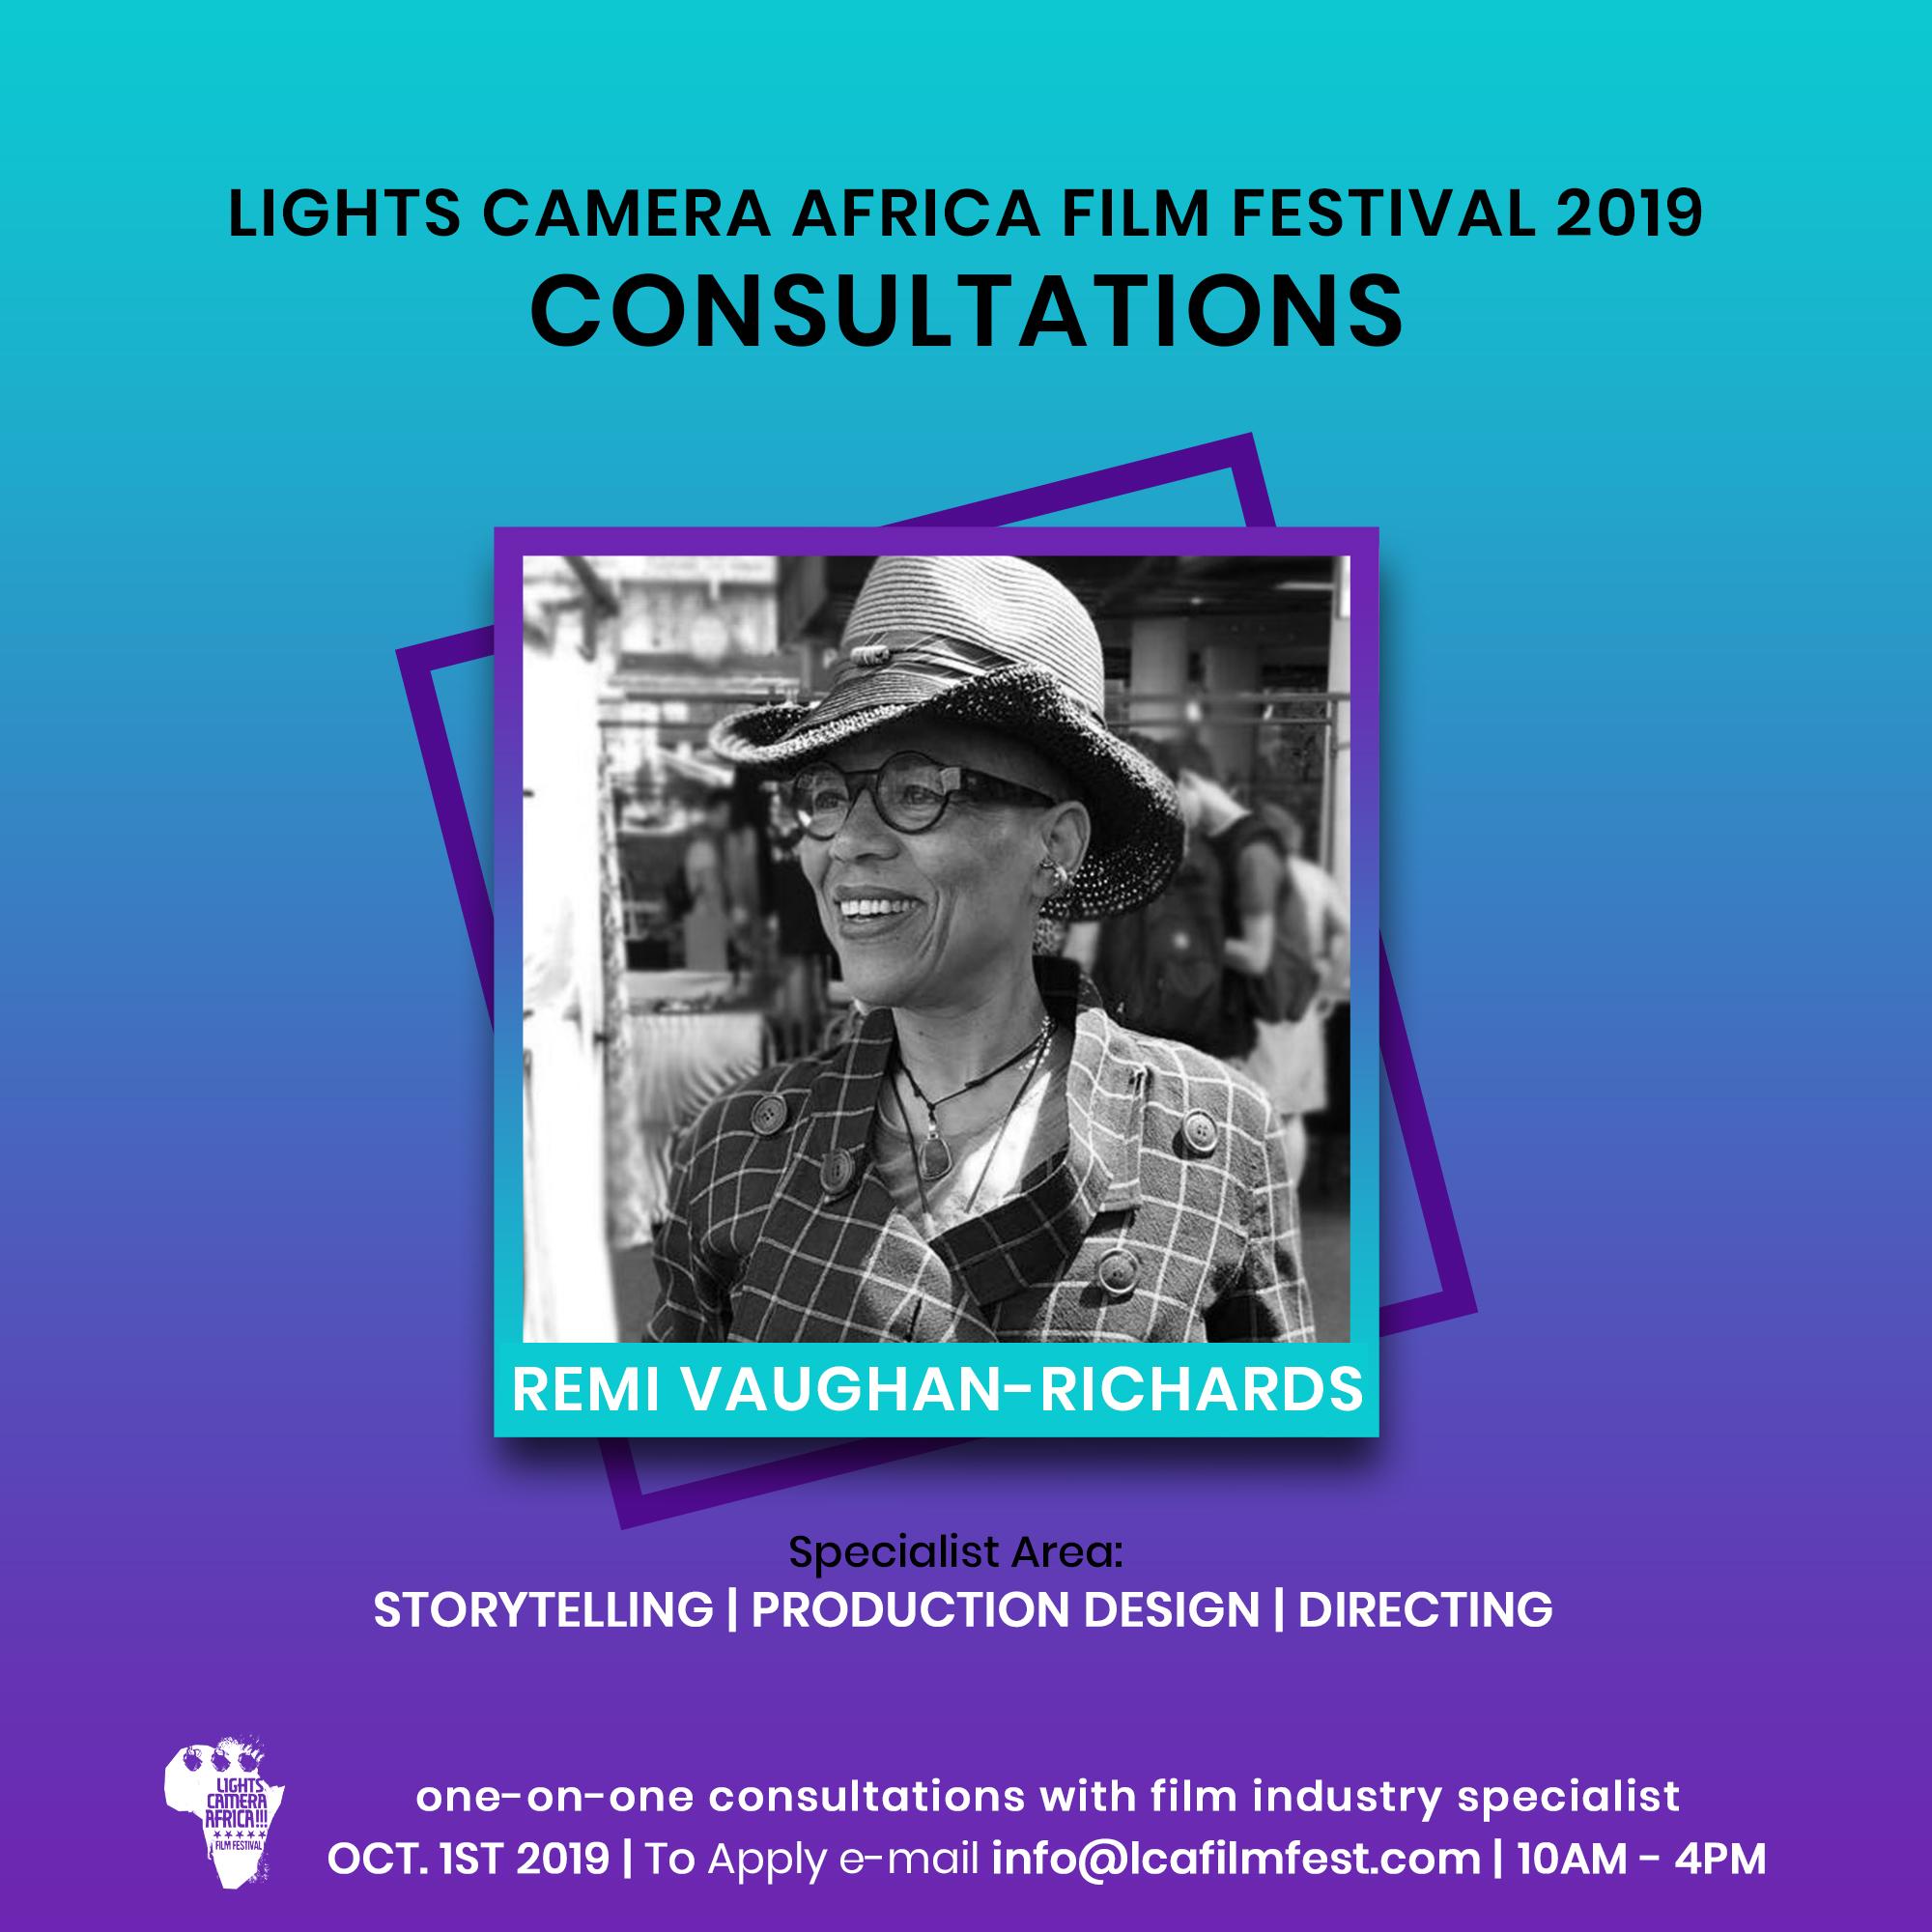 Lights Camera Africa Filmmaker Consultation Remi Vaughan-Richards